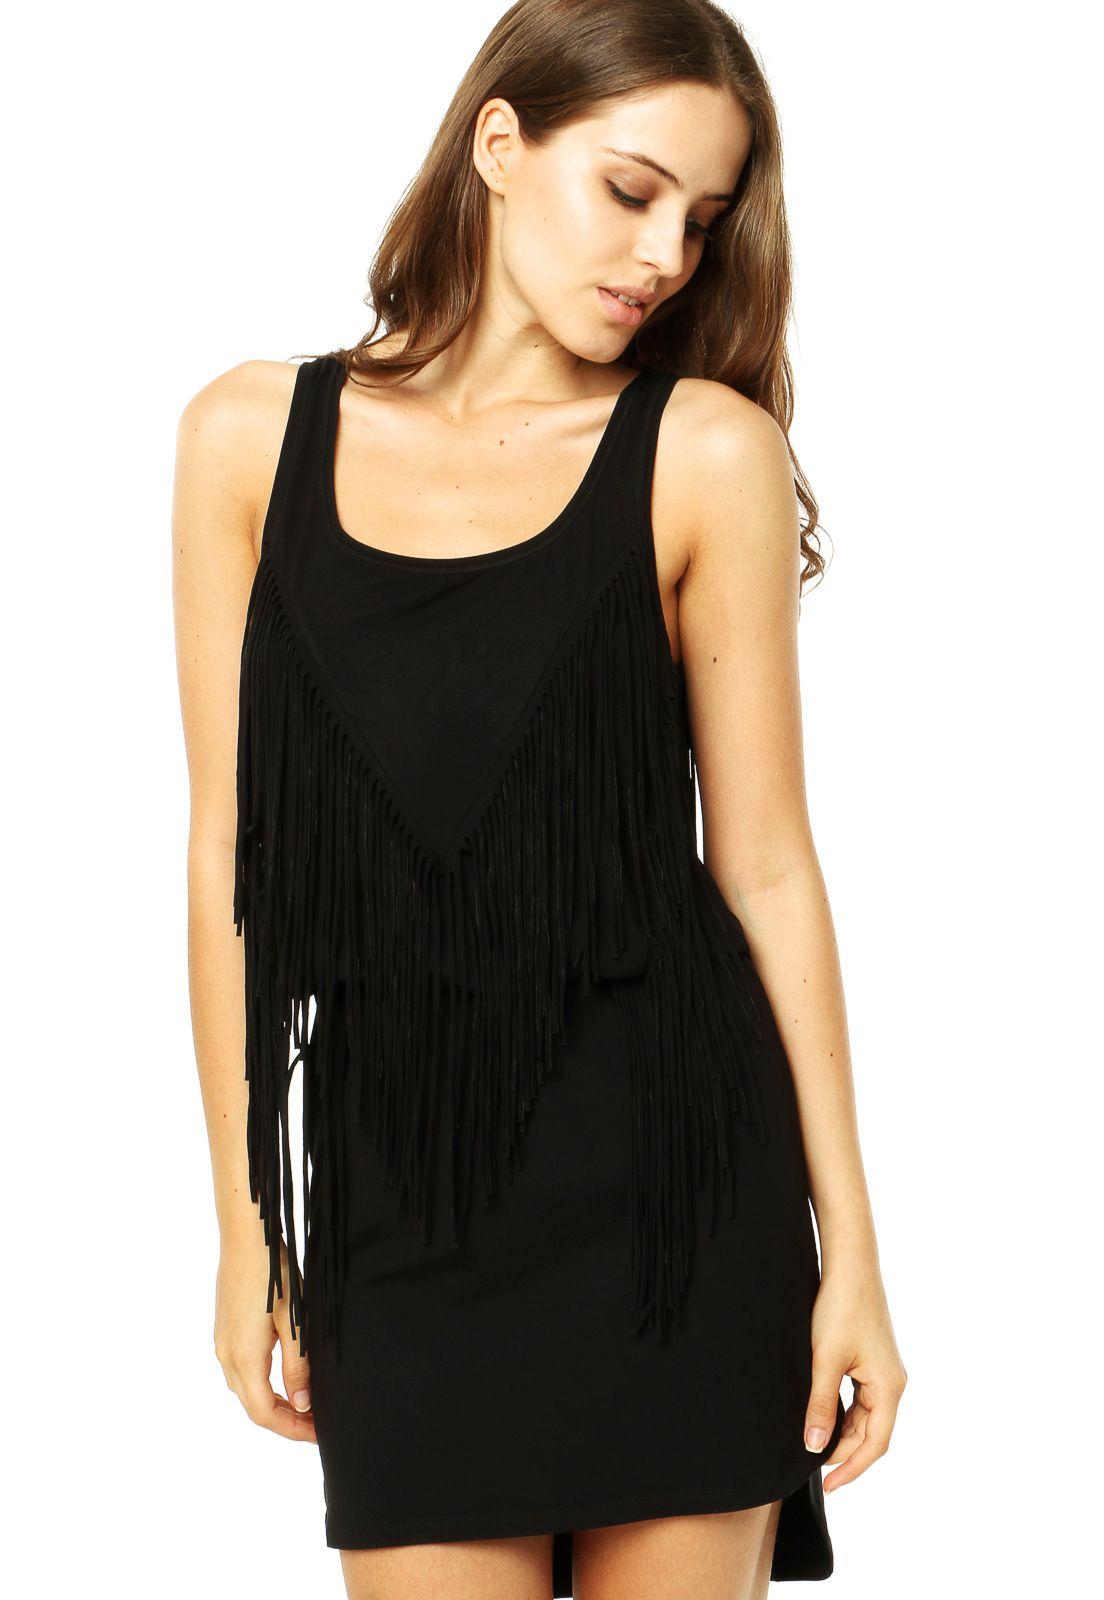 feb850377 Vestido Colcci Comfort Franjas Preto - Compre Agora